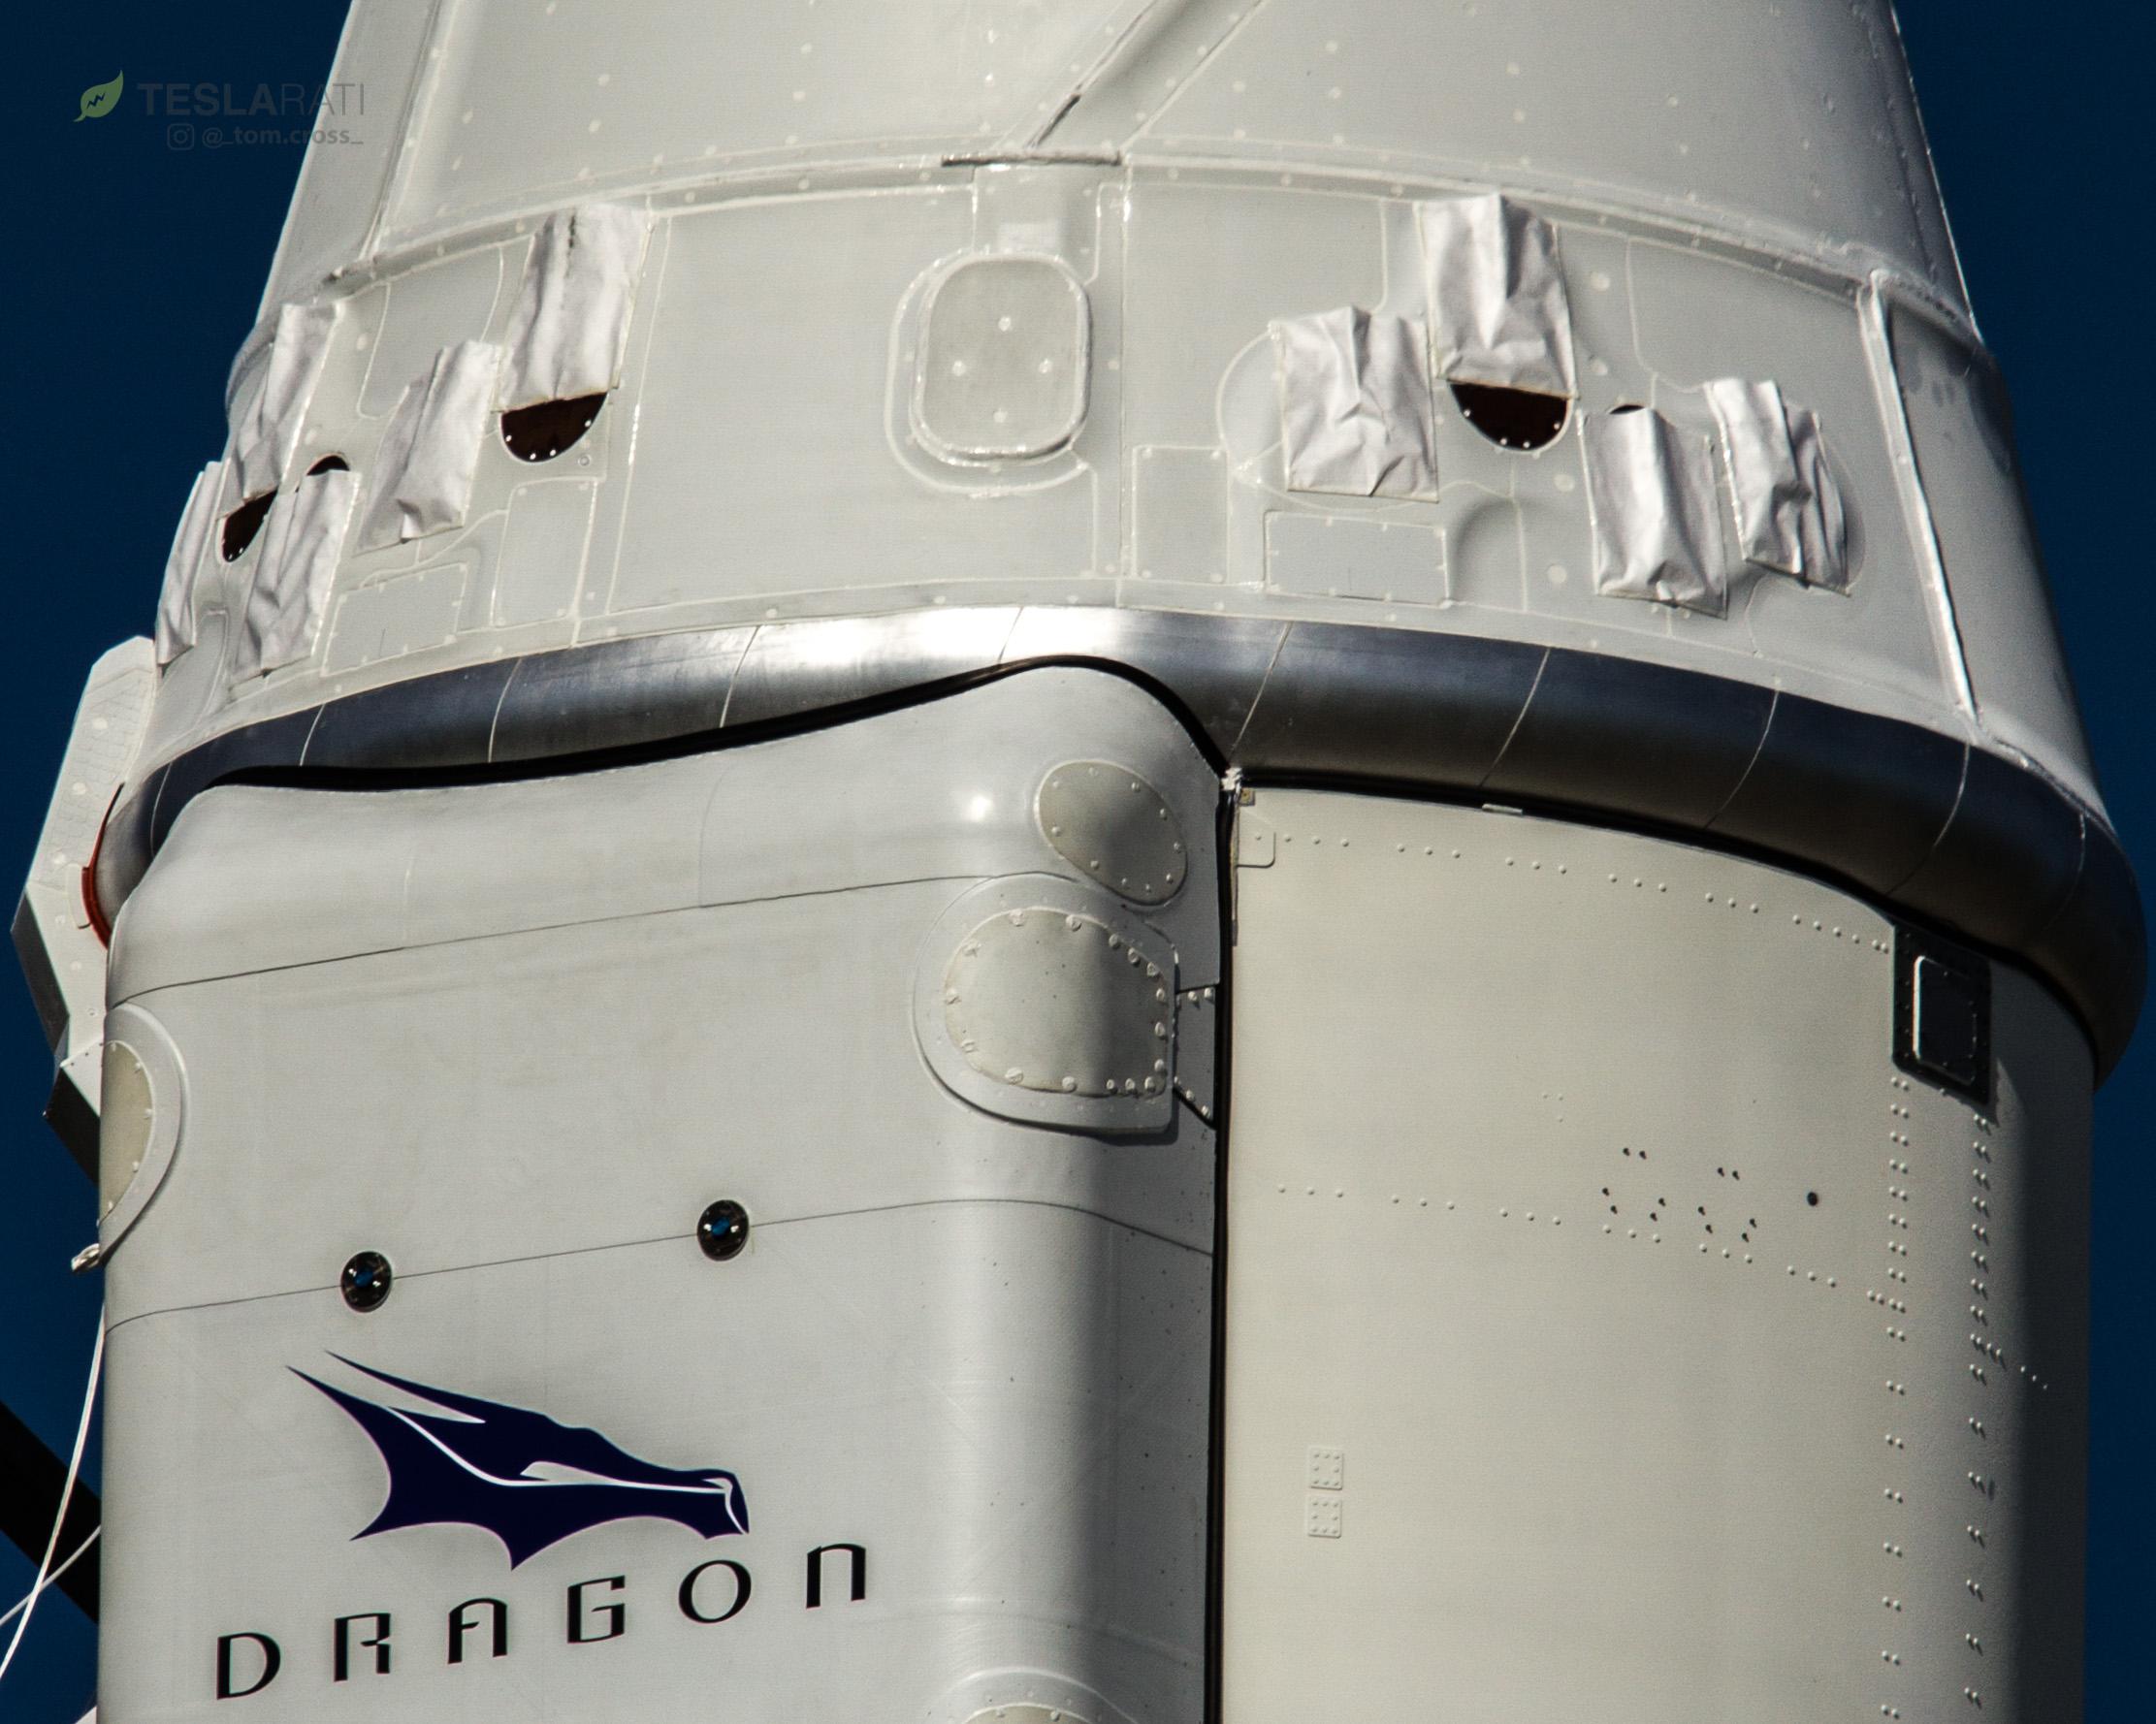 CRS-14 Dragon details 1 (Tom Cross)